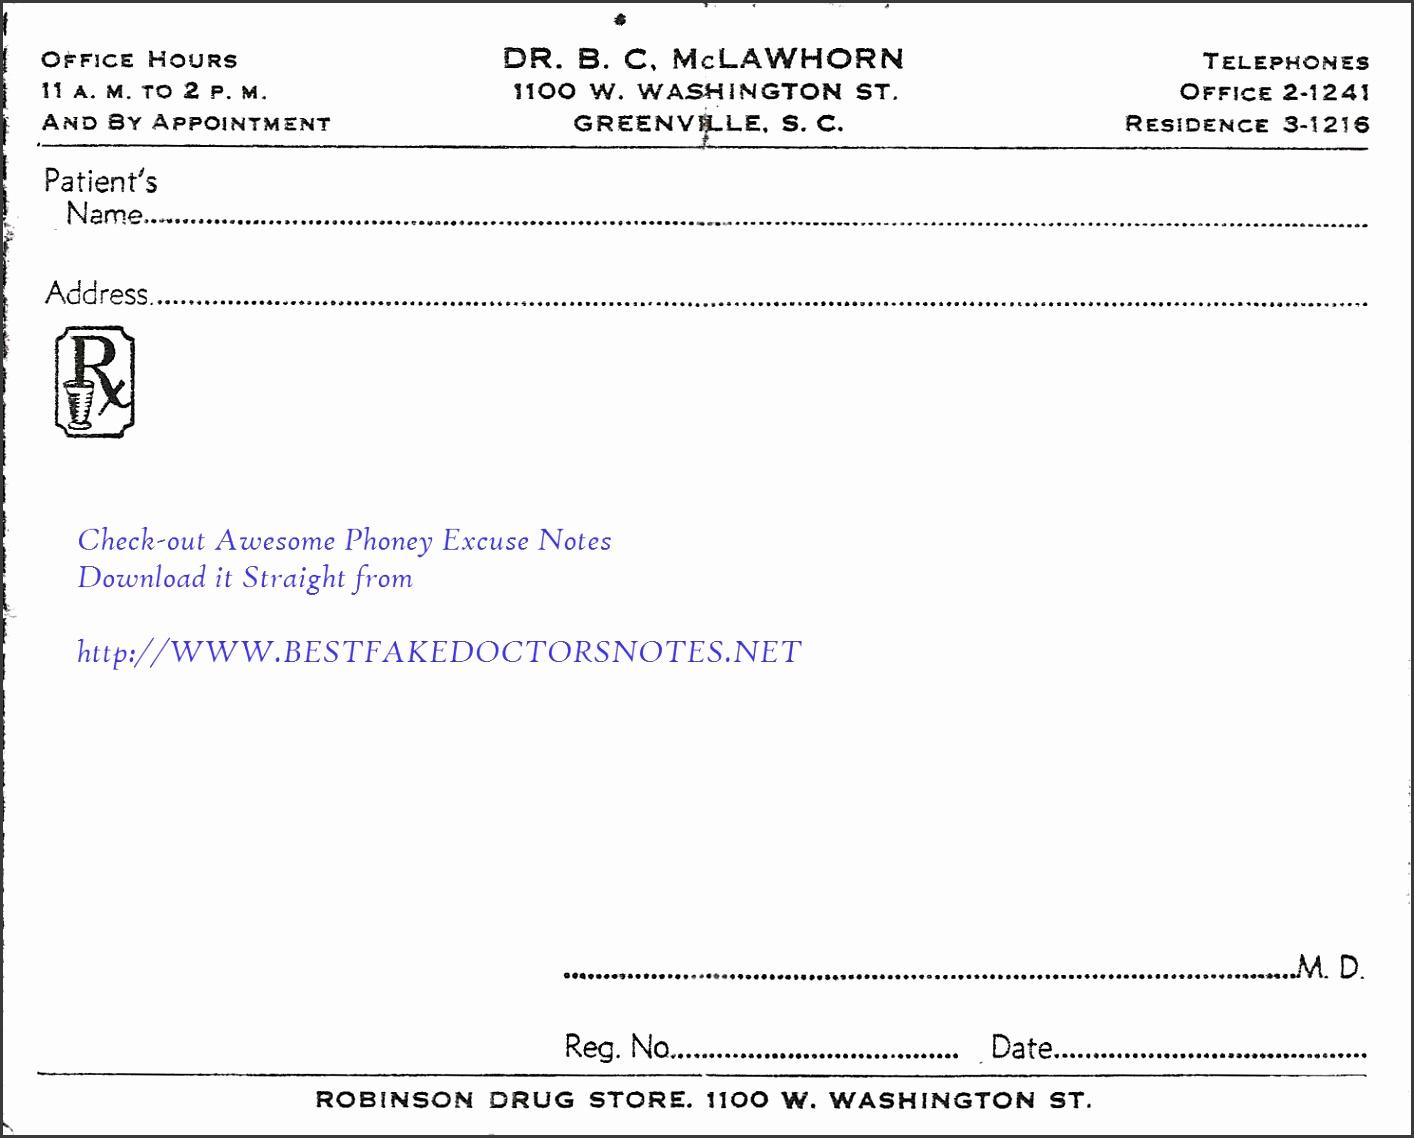 7 Doctors Note Template Download - SampleTemplatess - SampleTemplatess